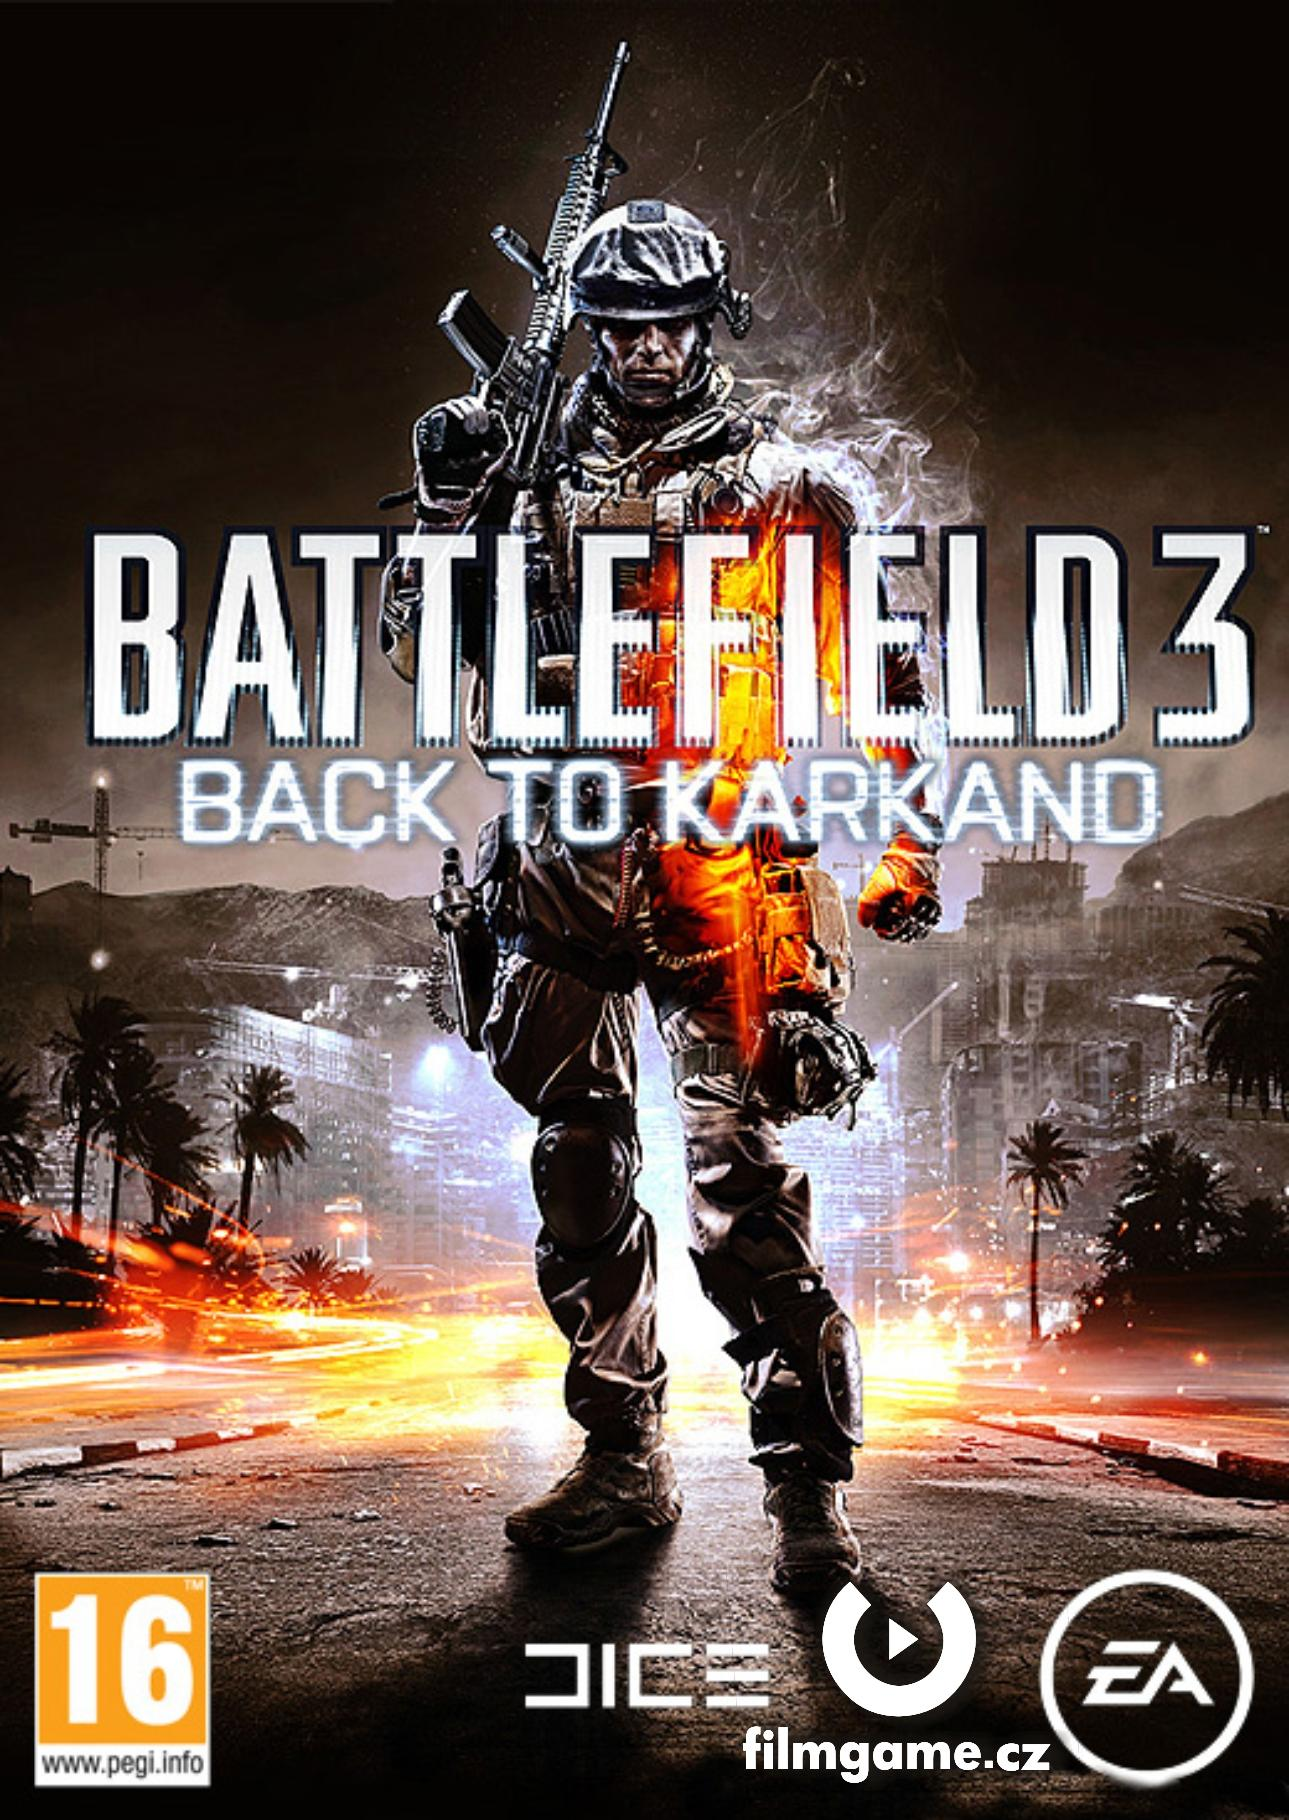 BATTLEFIELD 3: BACK TO KARKAND (PC online) - DATADISK - PC